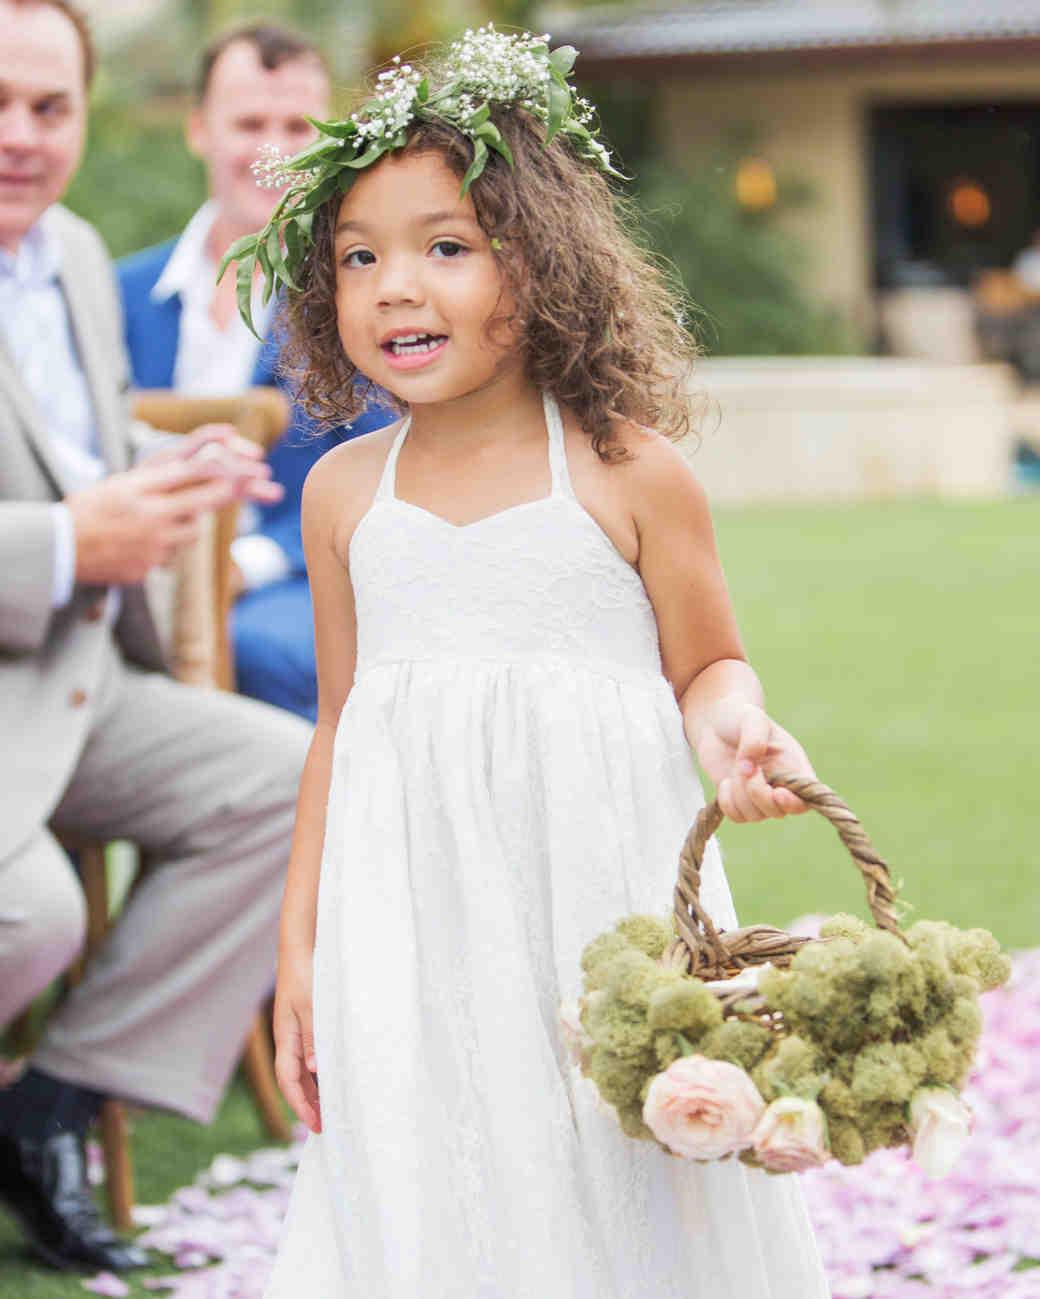 renee-matthew-wedding-maui-hawaii-morison-021-s111851.jpg